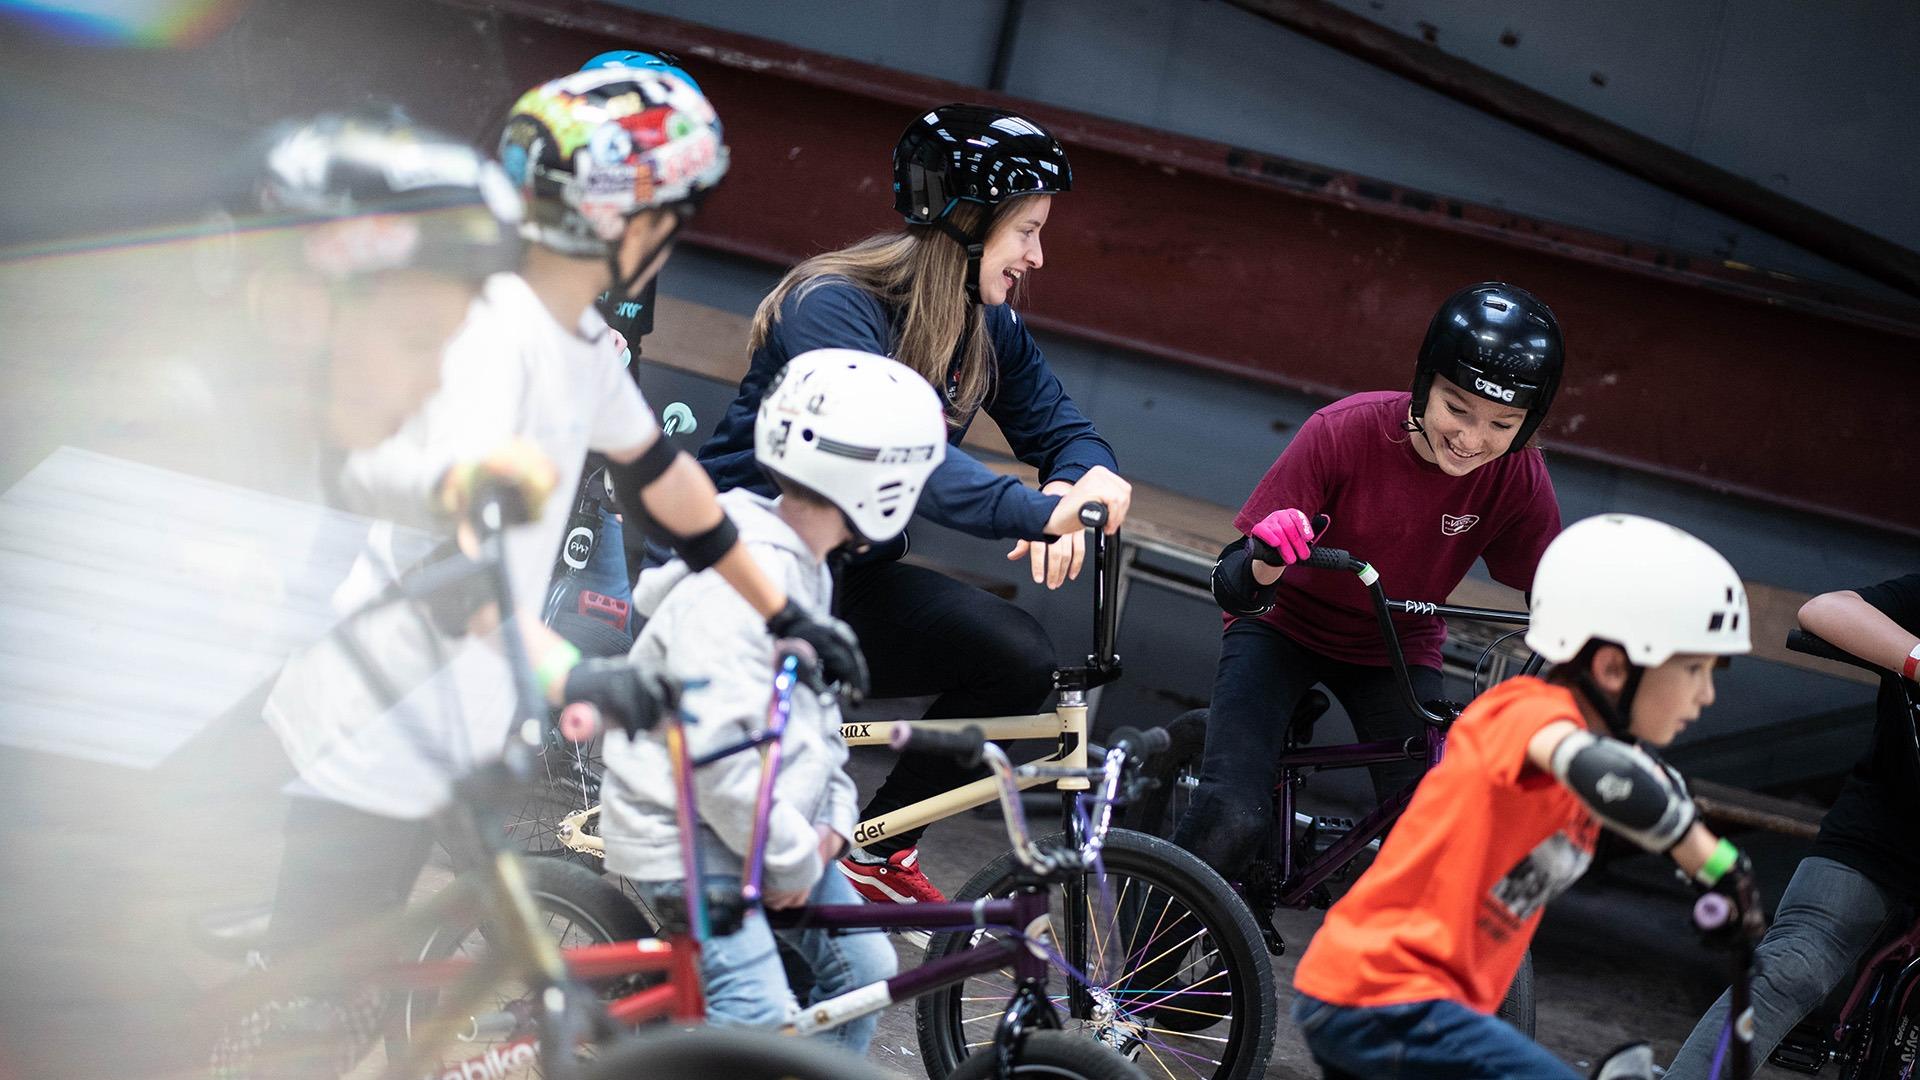 HIGHLIGHTS: Kids Jam @ Adrenaline Alley - National Championships Weekend